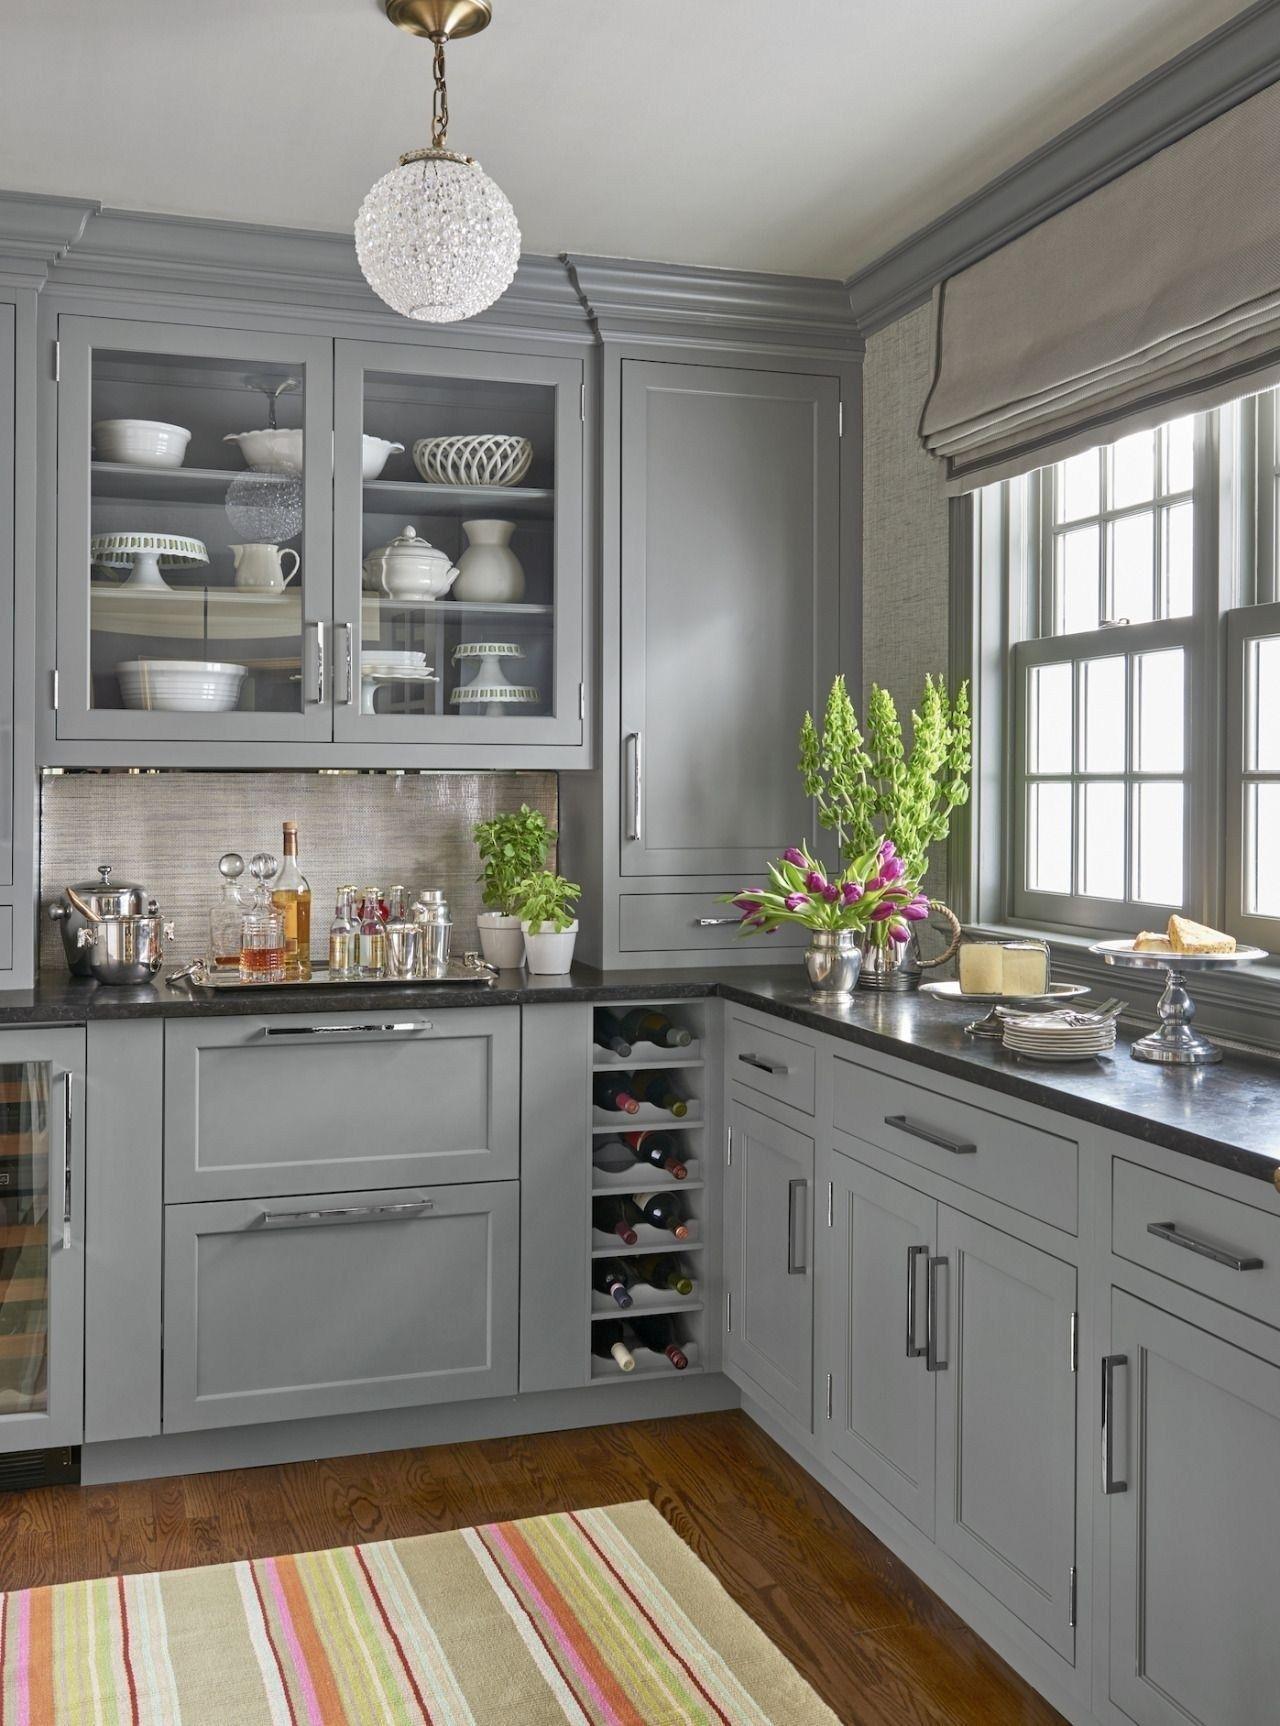 49 stylish gray kitchen cabinet design ideas kitchen grey kitchen cabinets kitchen on kitchen decor grey cabinets id=96332